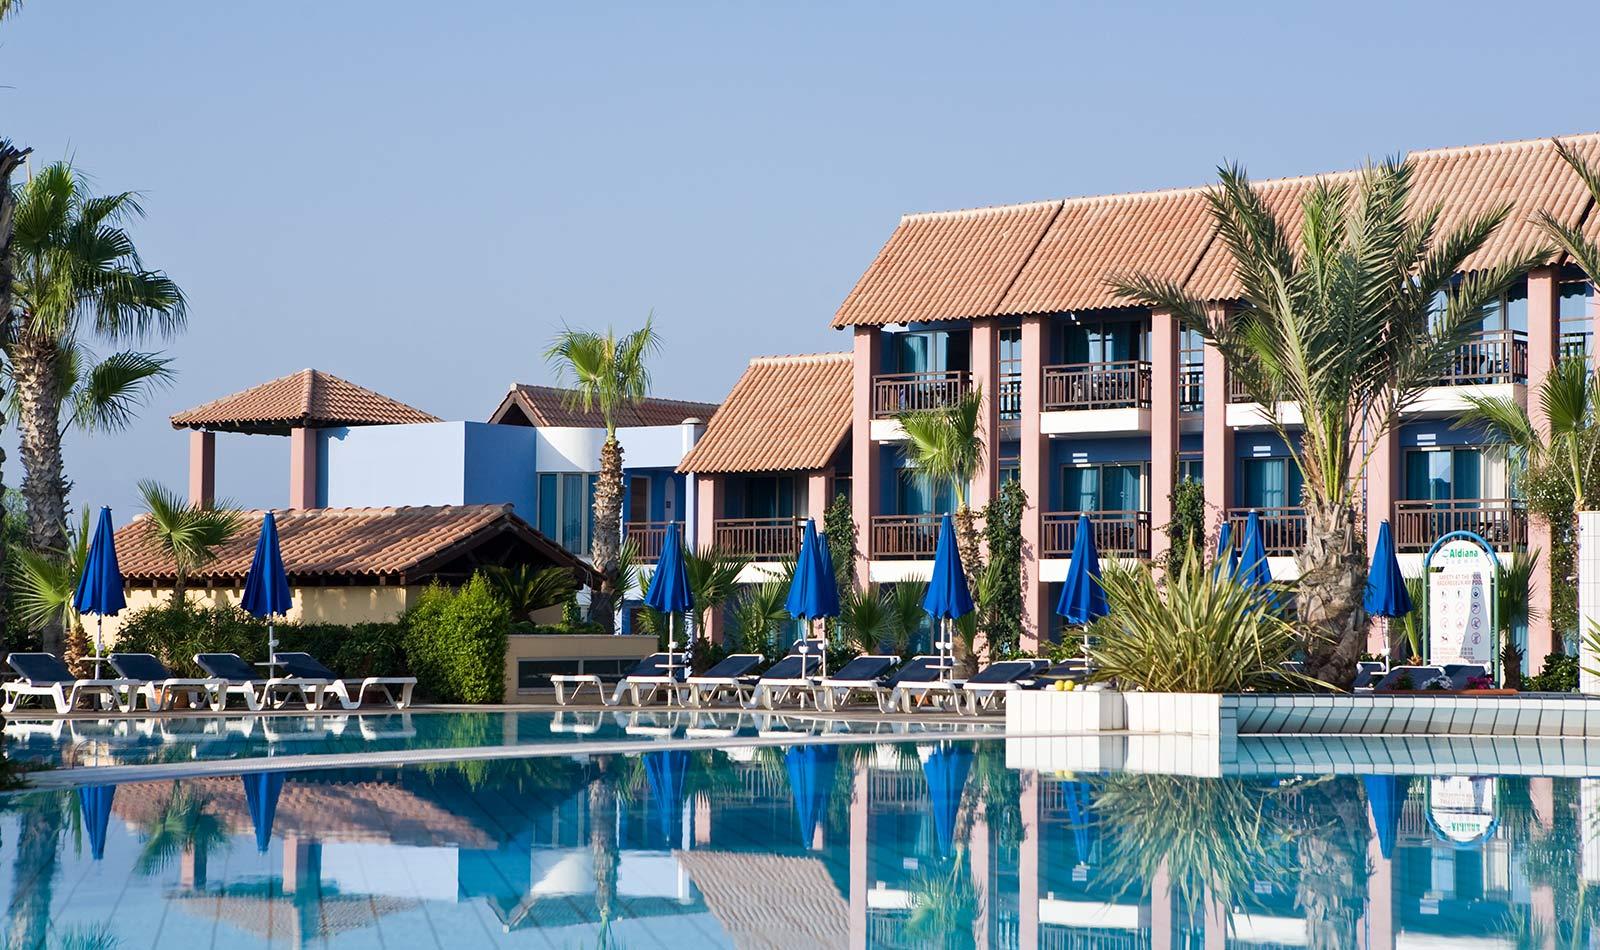 Aldiana Club Zypern - Zypern